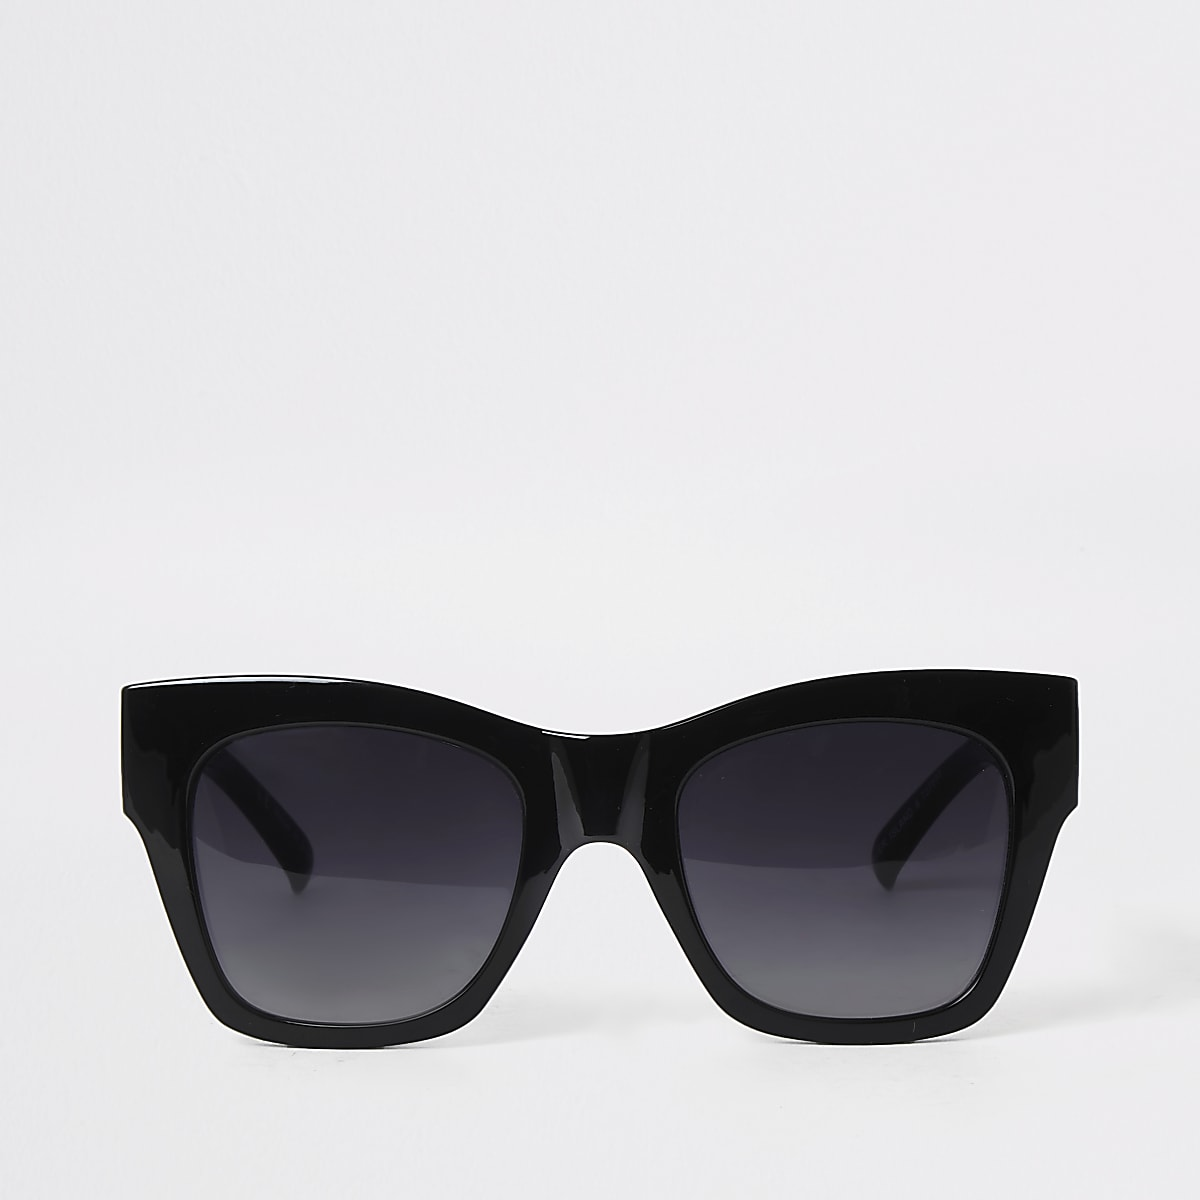 Black gold chain trim oversized sunglasses